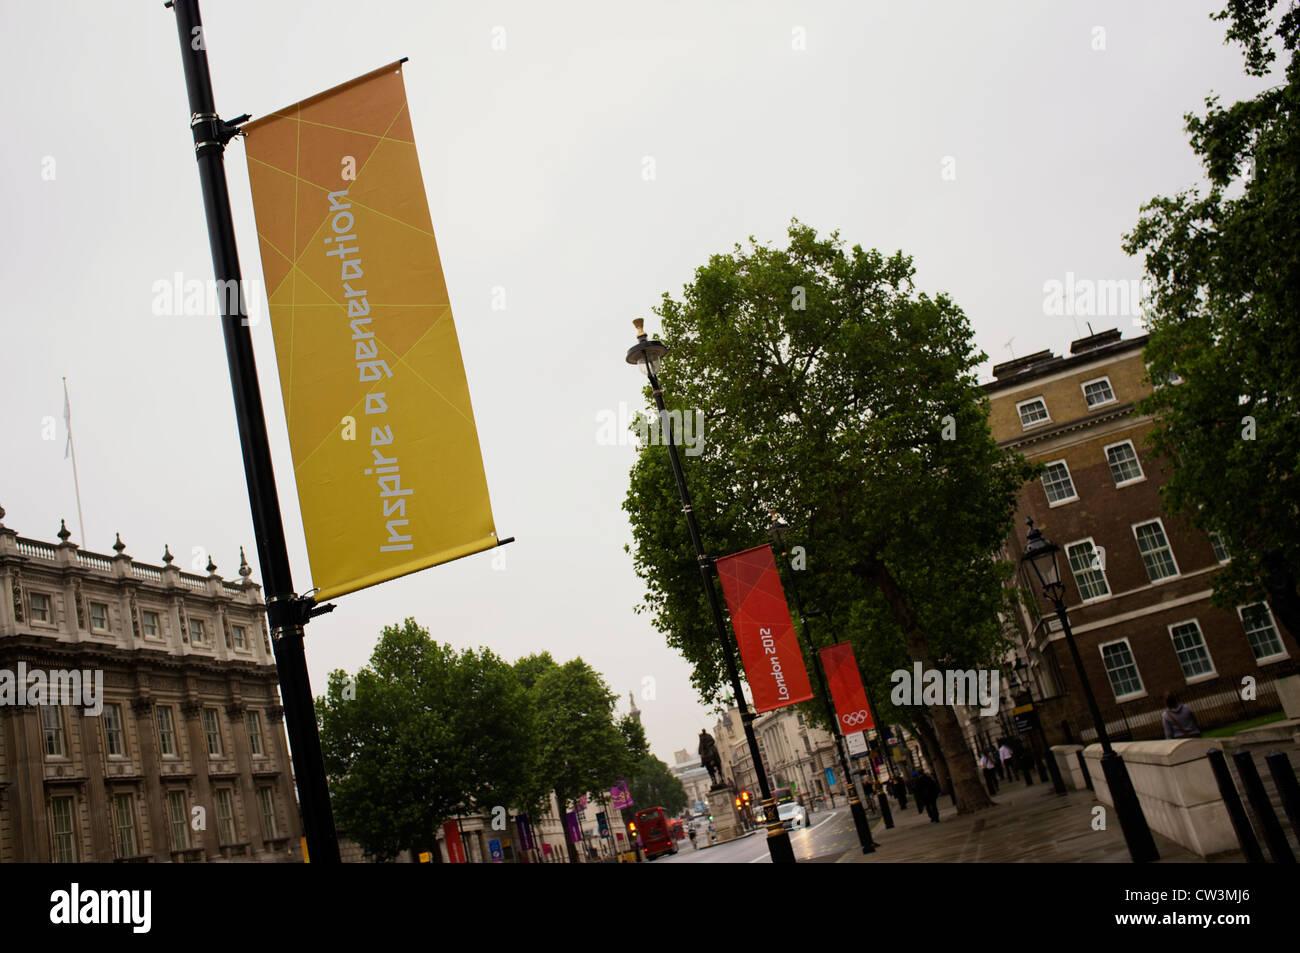 "'Inspire une génération"" sign in London Photo Stock"